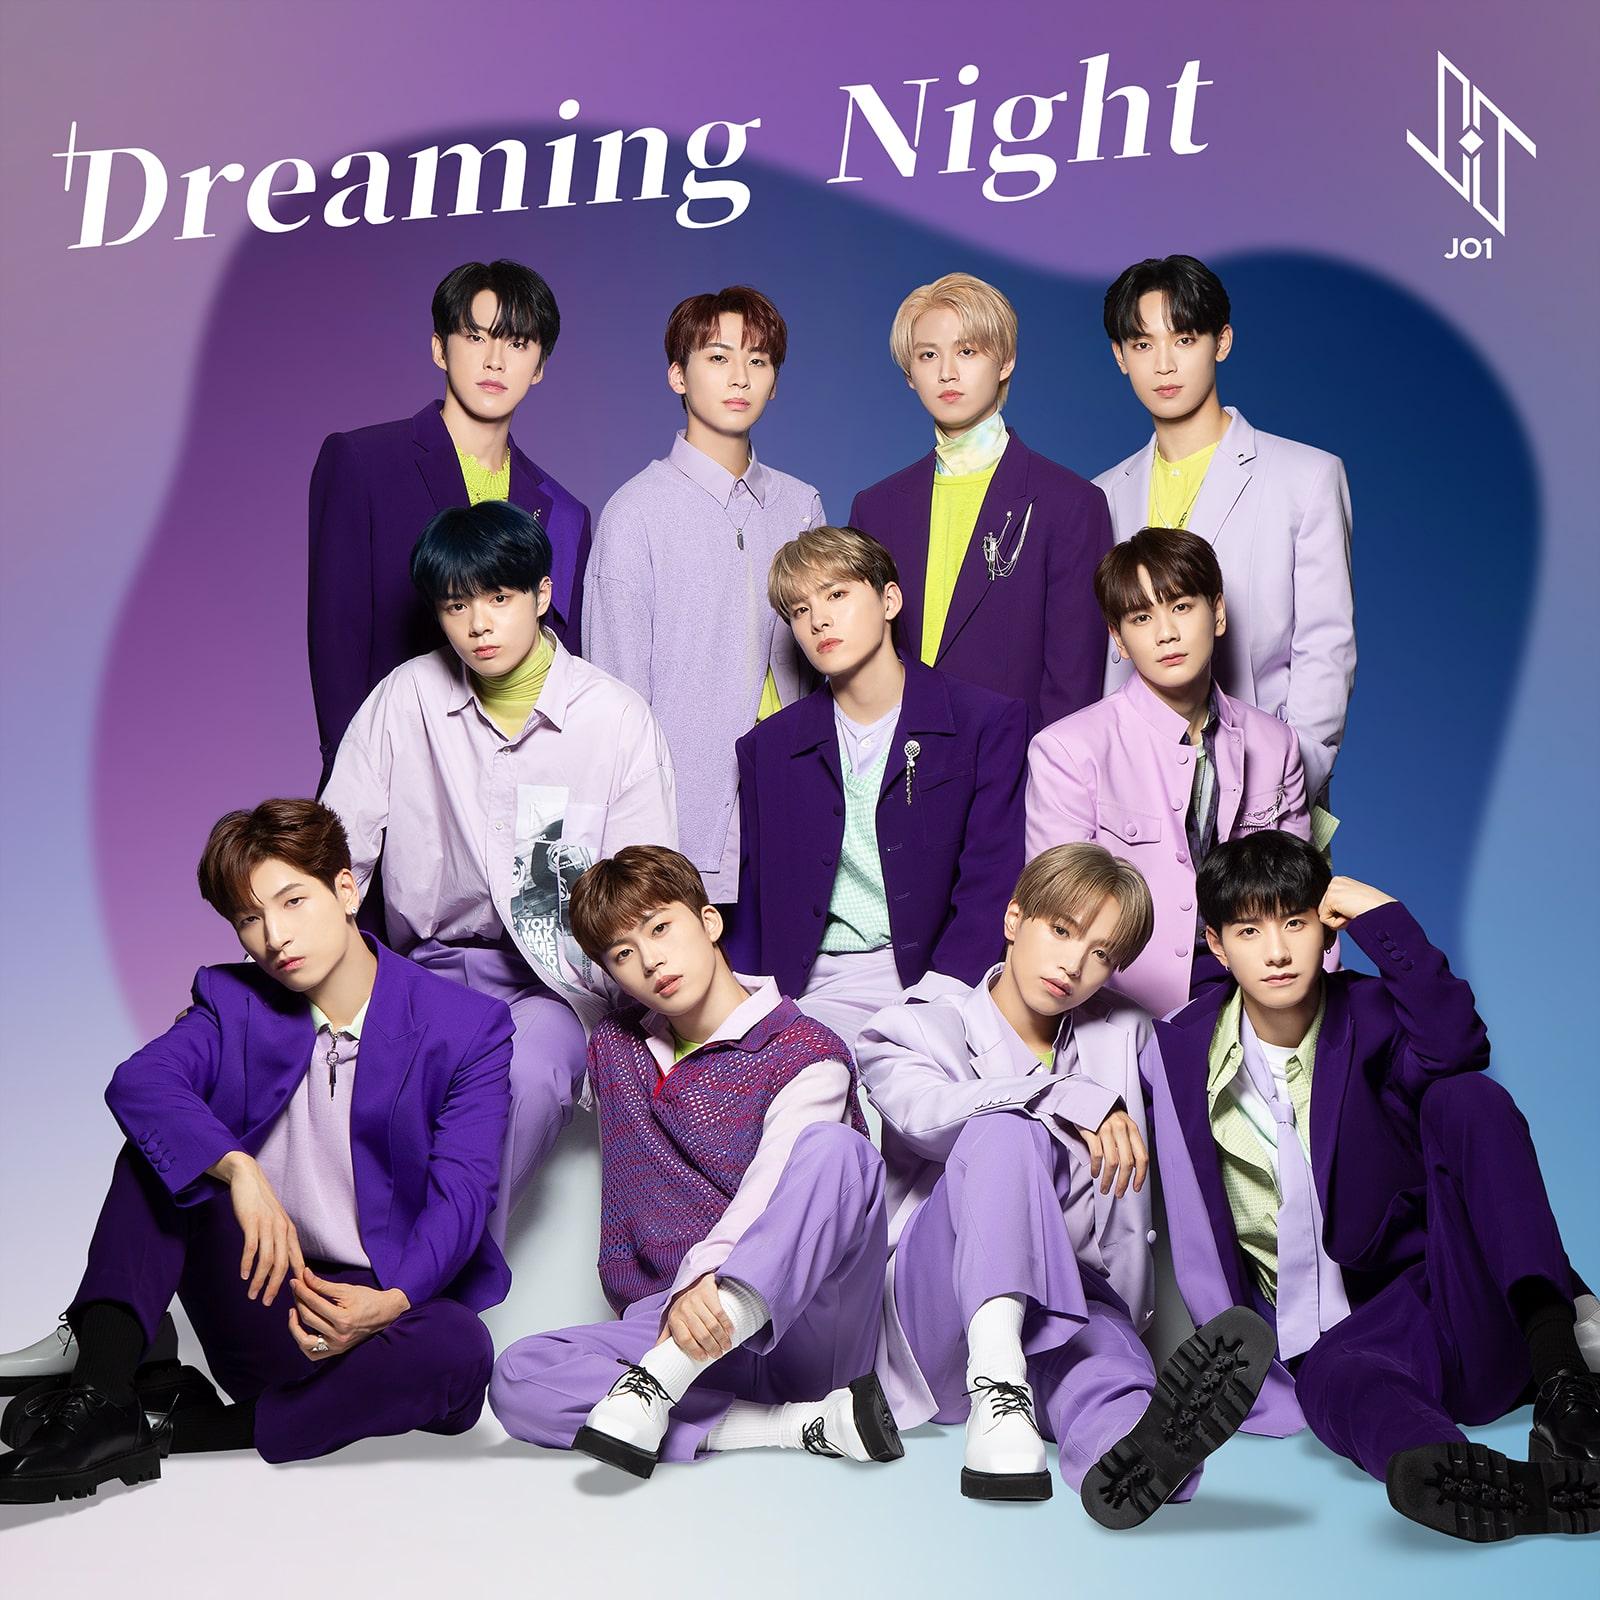 jo1配信JK_Dreaming Night_pf-min